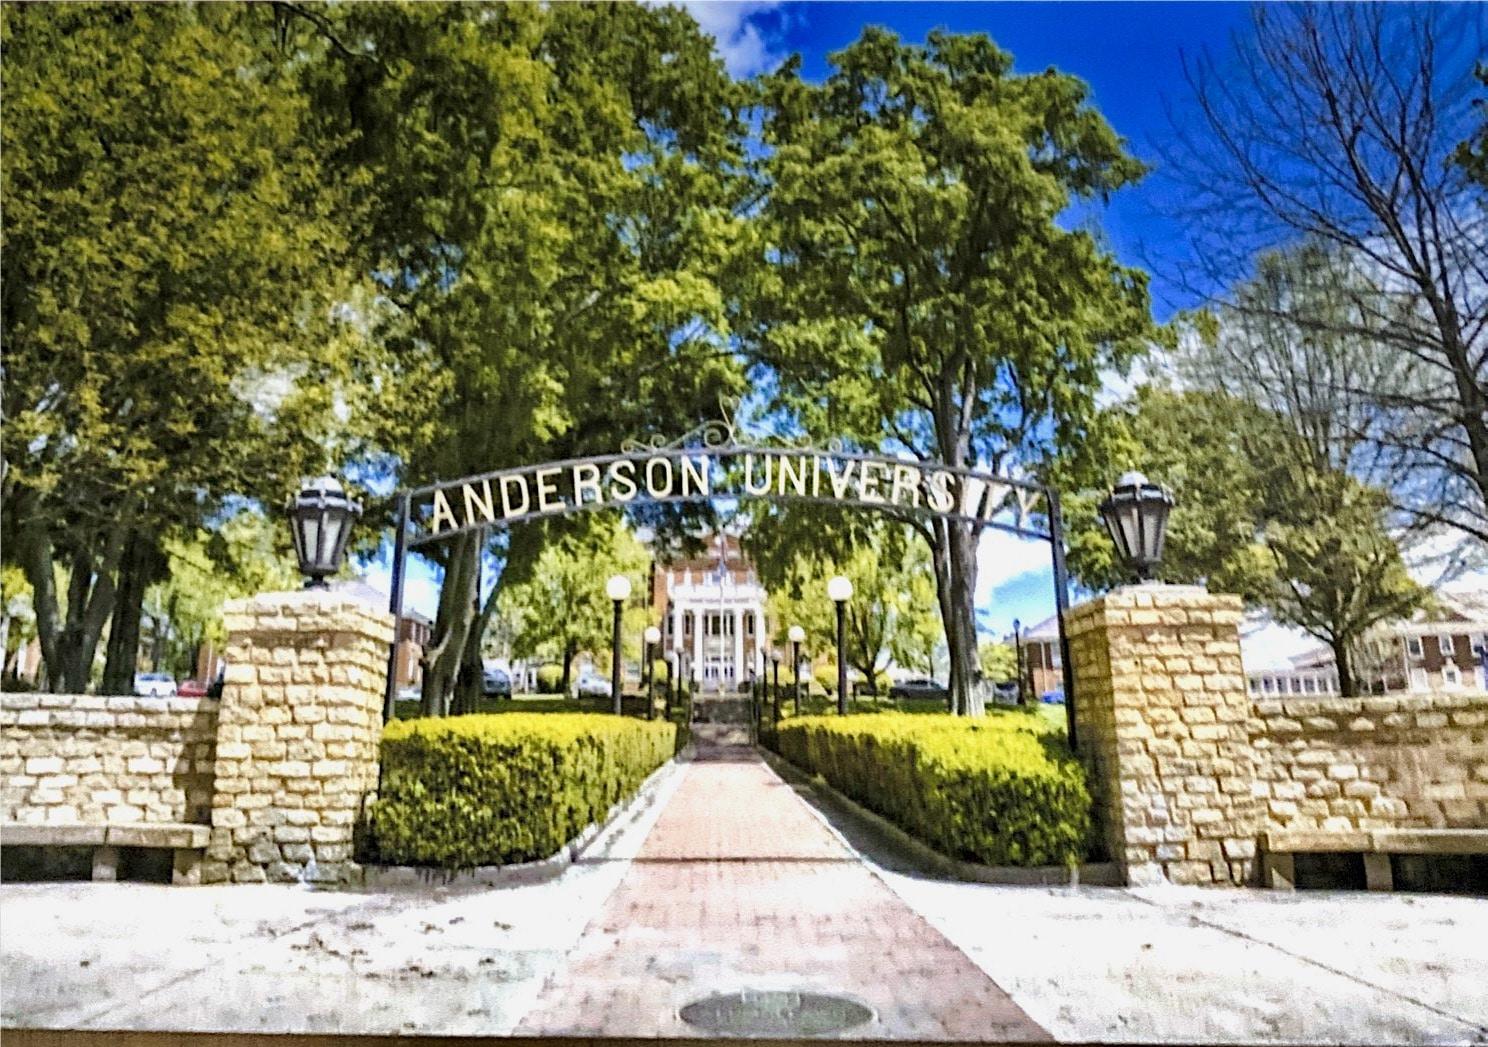 Anderson University1